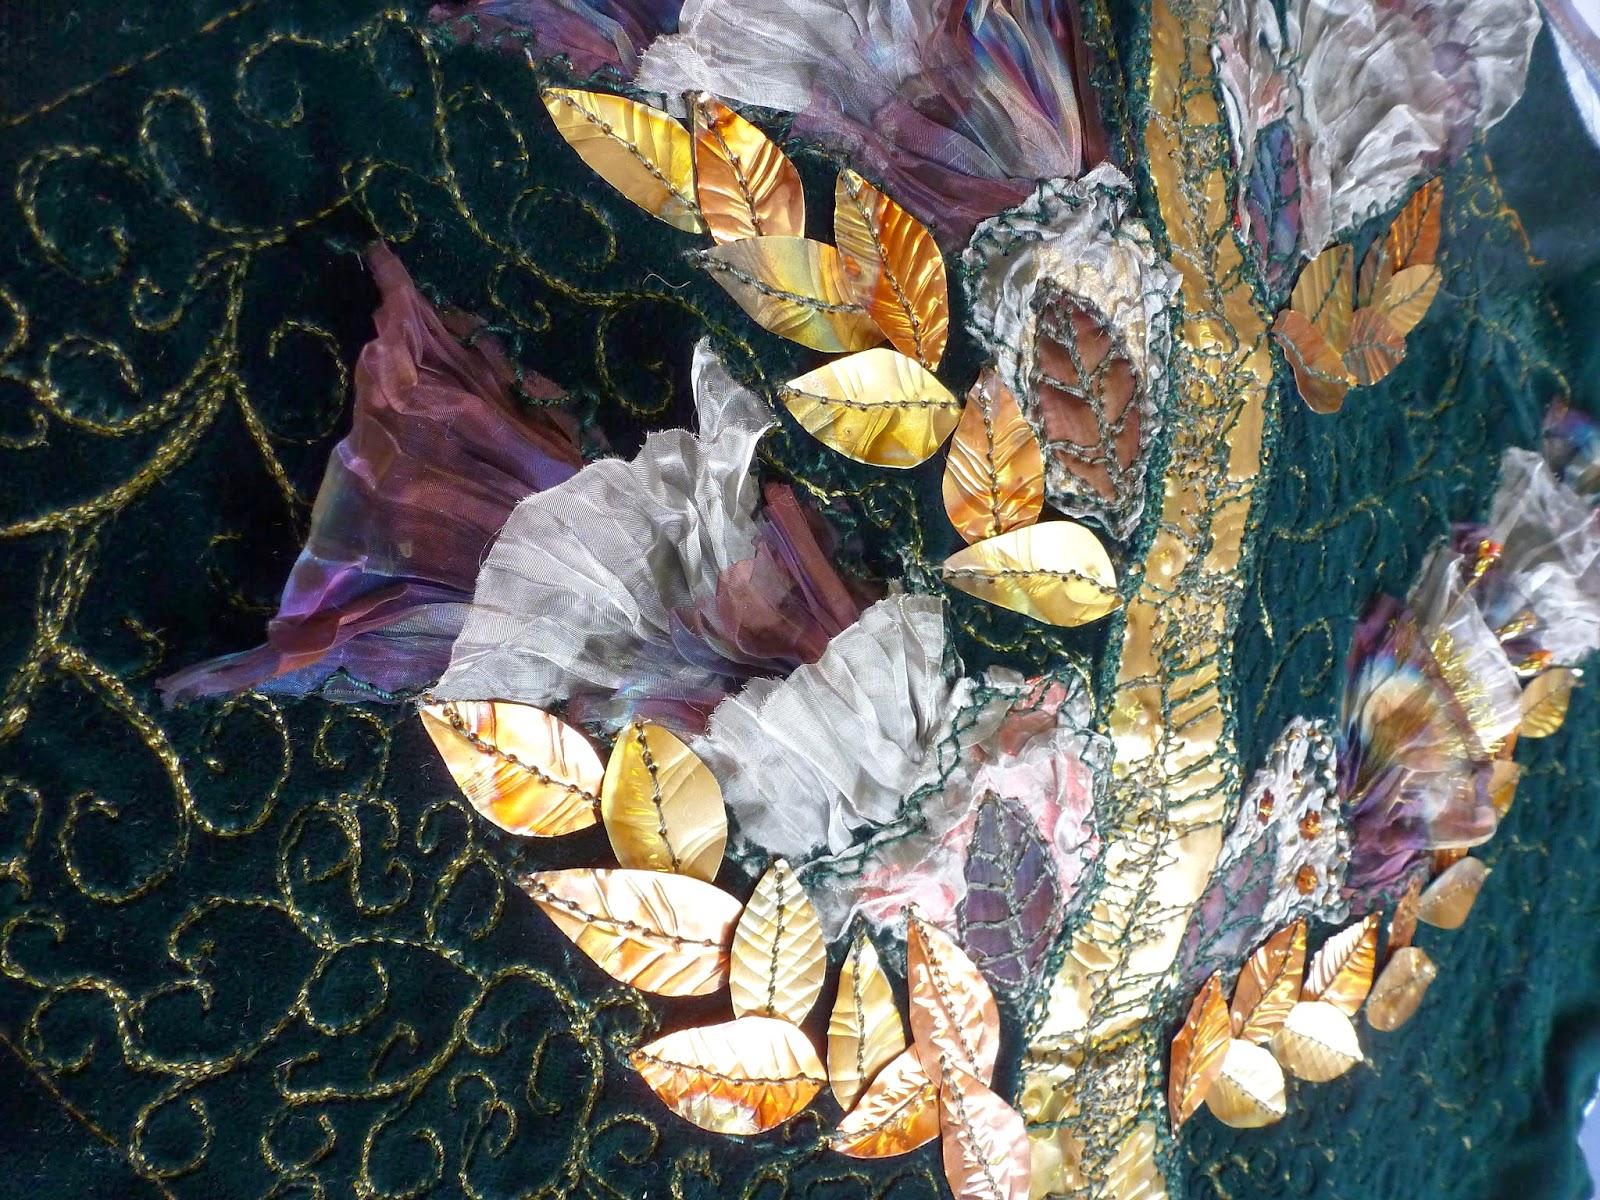 Richly Stitched With Alysn Midgelow-Marsden